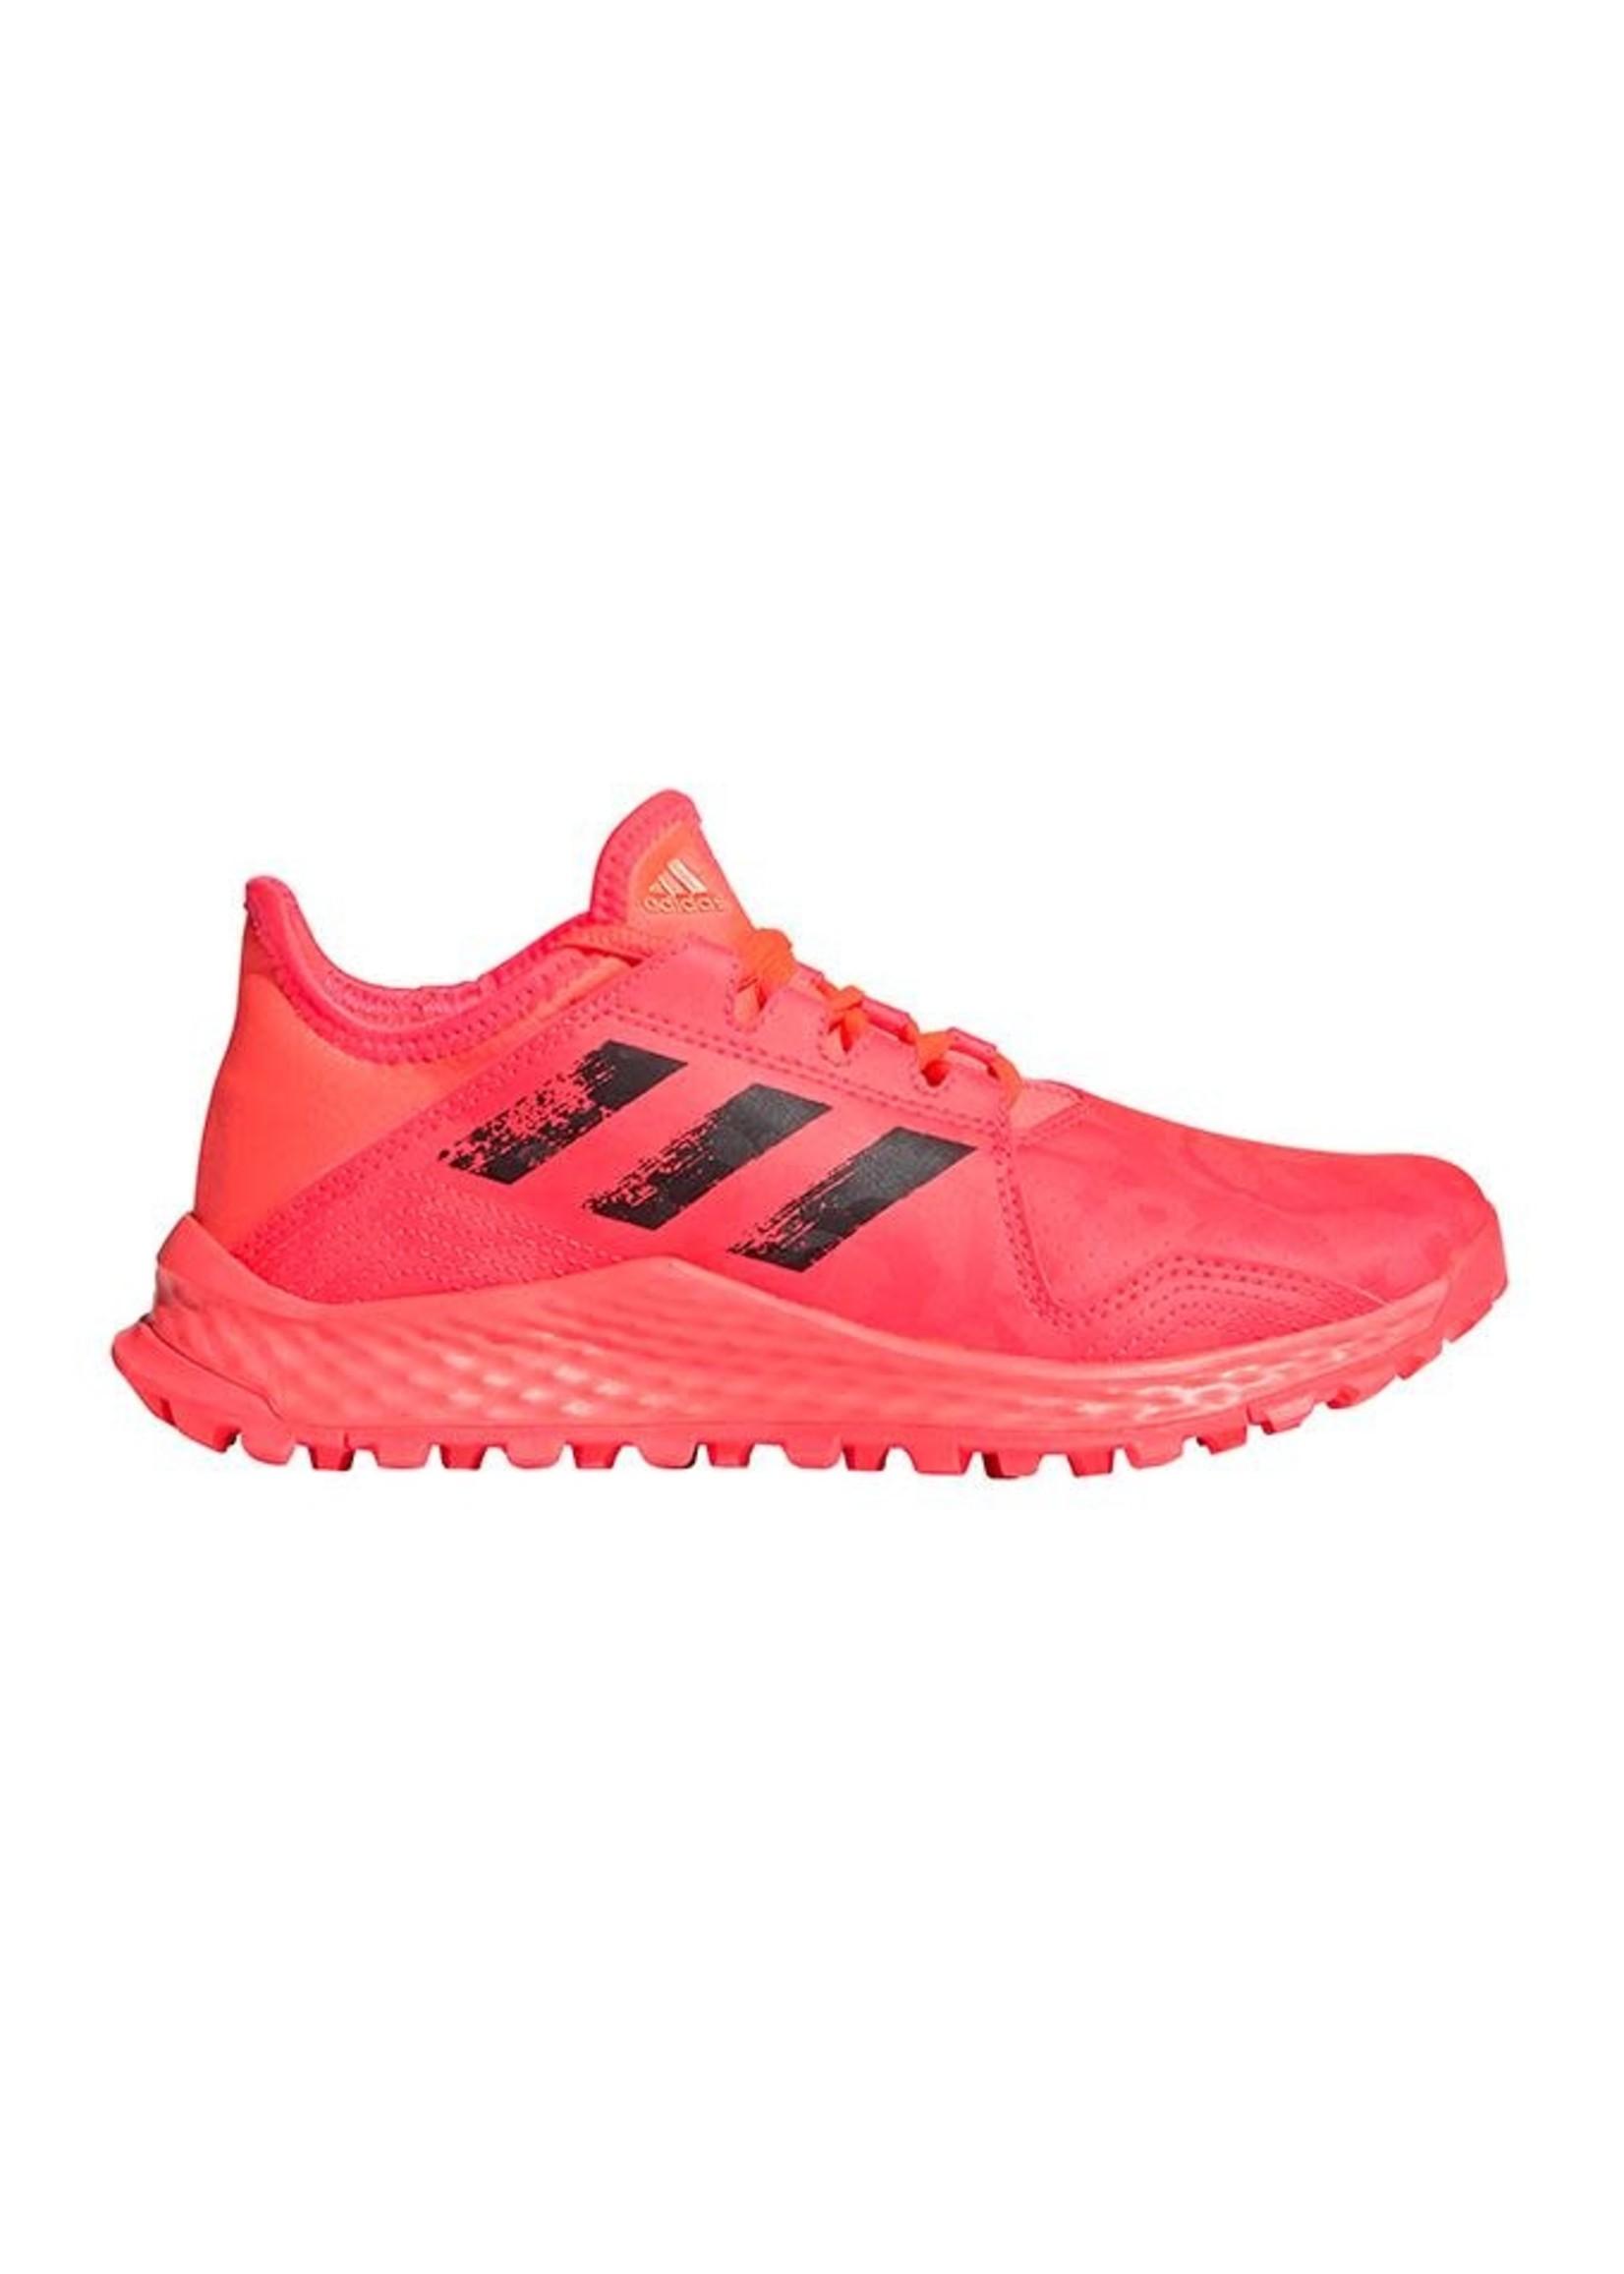 Adidas Adidas Youngstar Hockey Shoe (Astro) - Pink (2020)